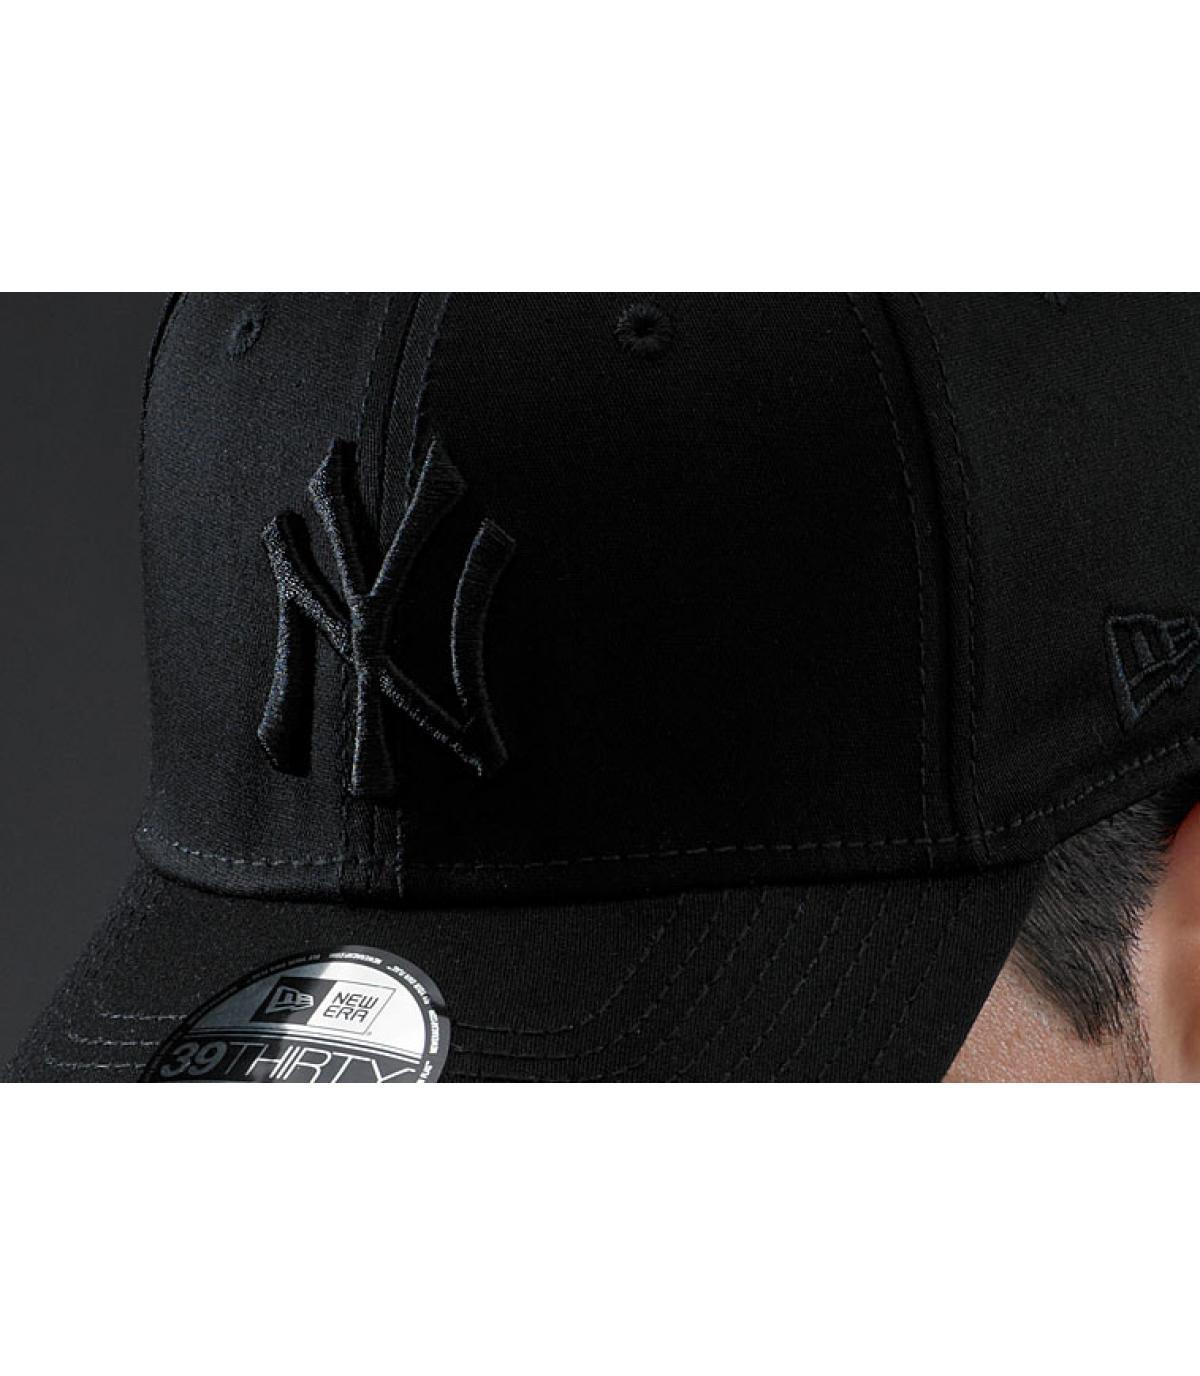 Dettagli 39thirty NY noir noir - image 5